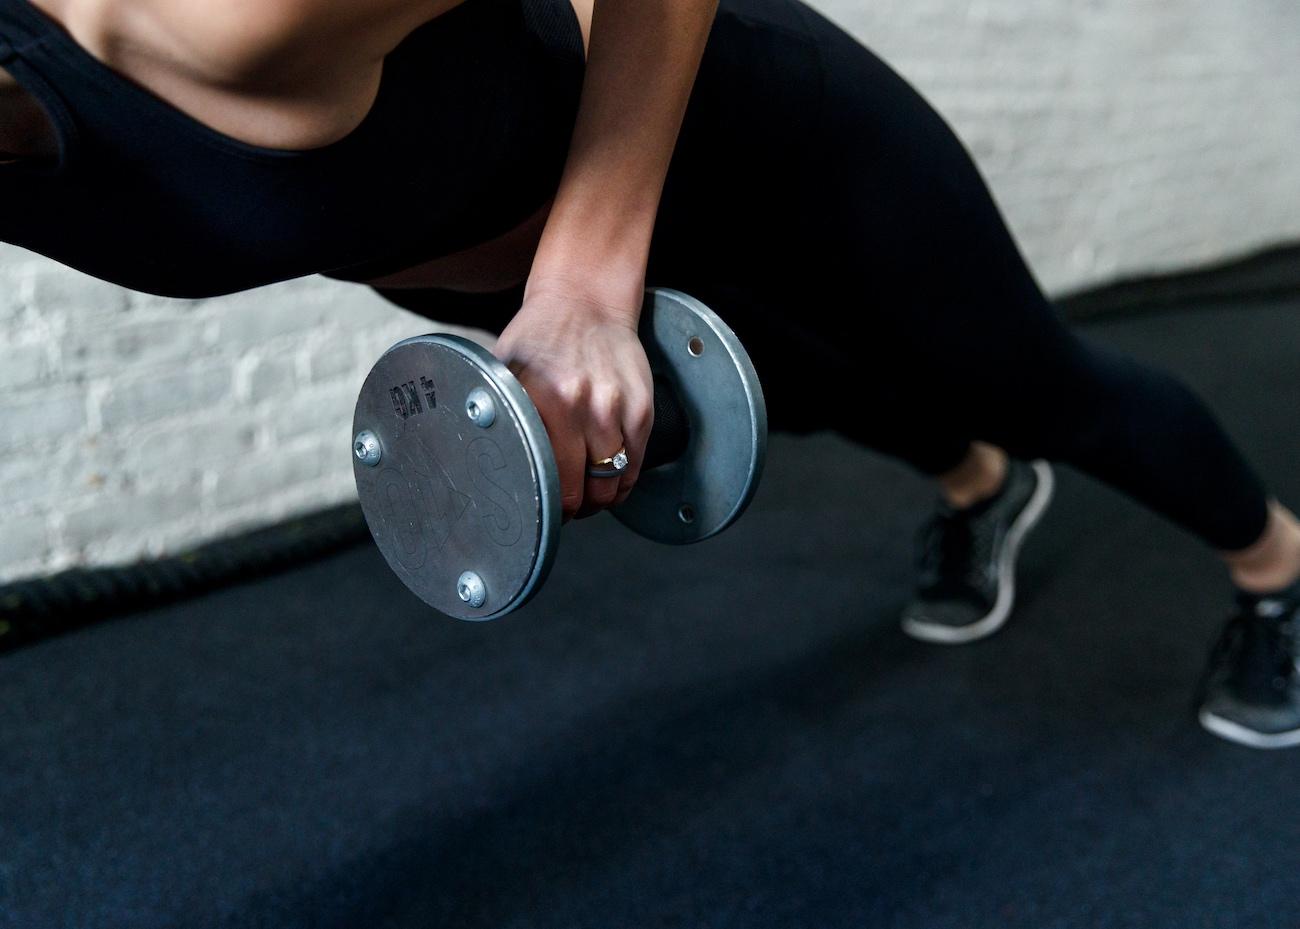 Buffr Ring Guard Workout Accessory